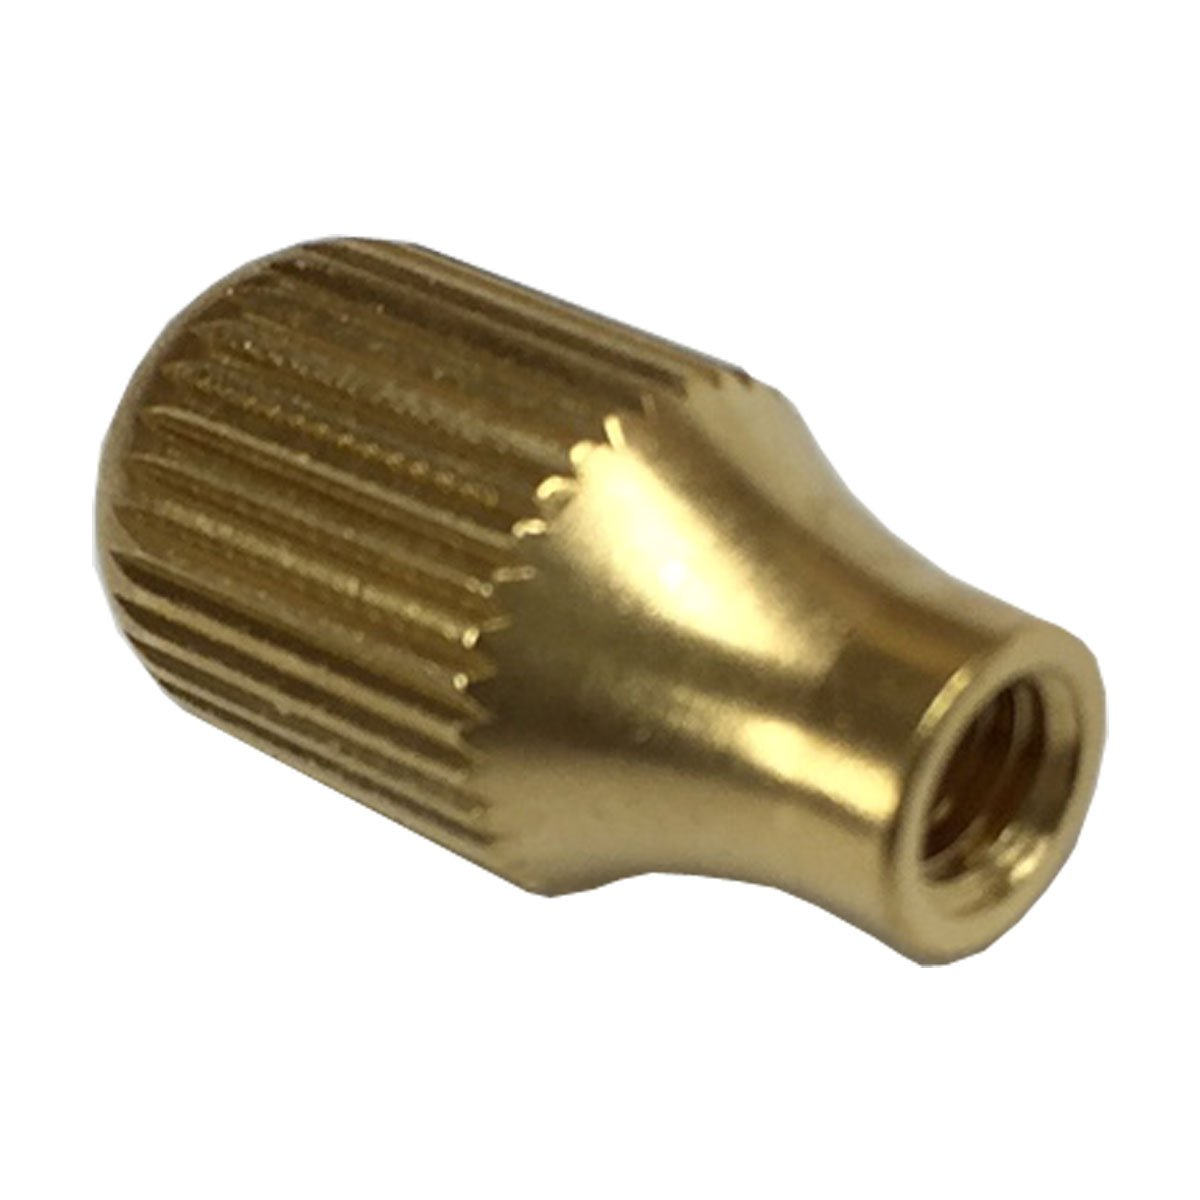 BG ANGL Spare Nut, Saxophone Fabric Ligature, Gold Lacquer